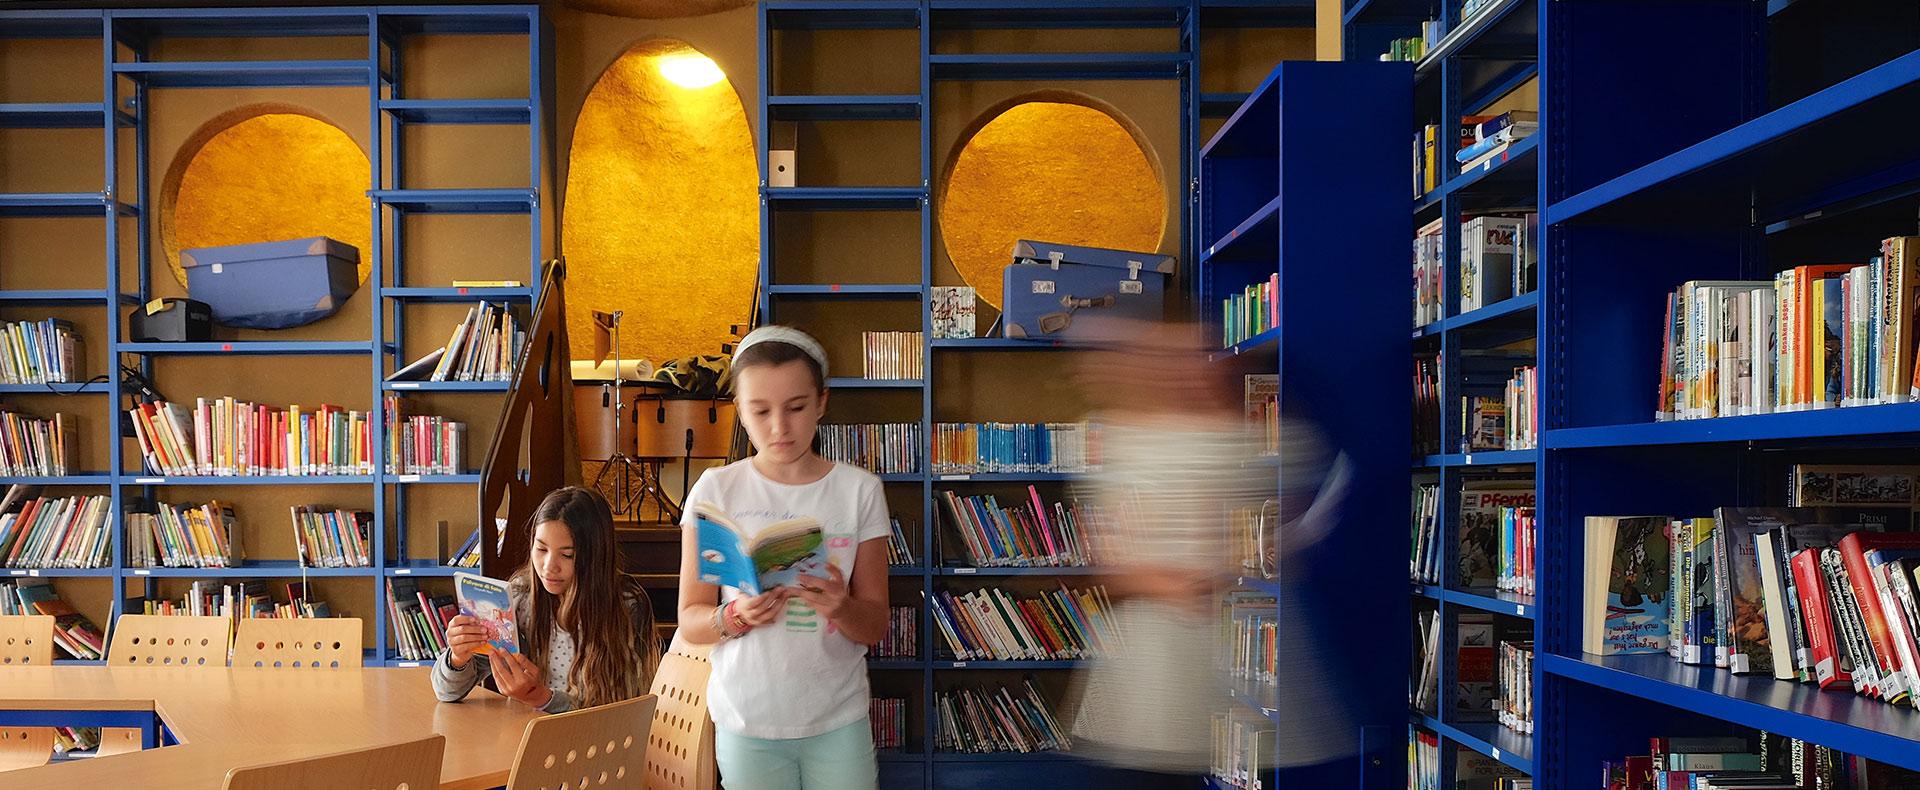 Studentesse studiano nella biblioteca scolastica